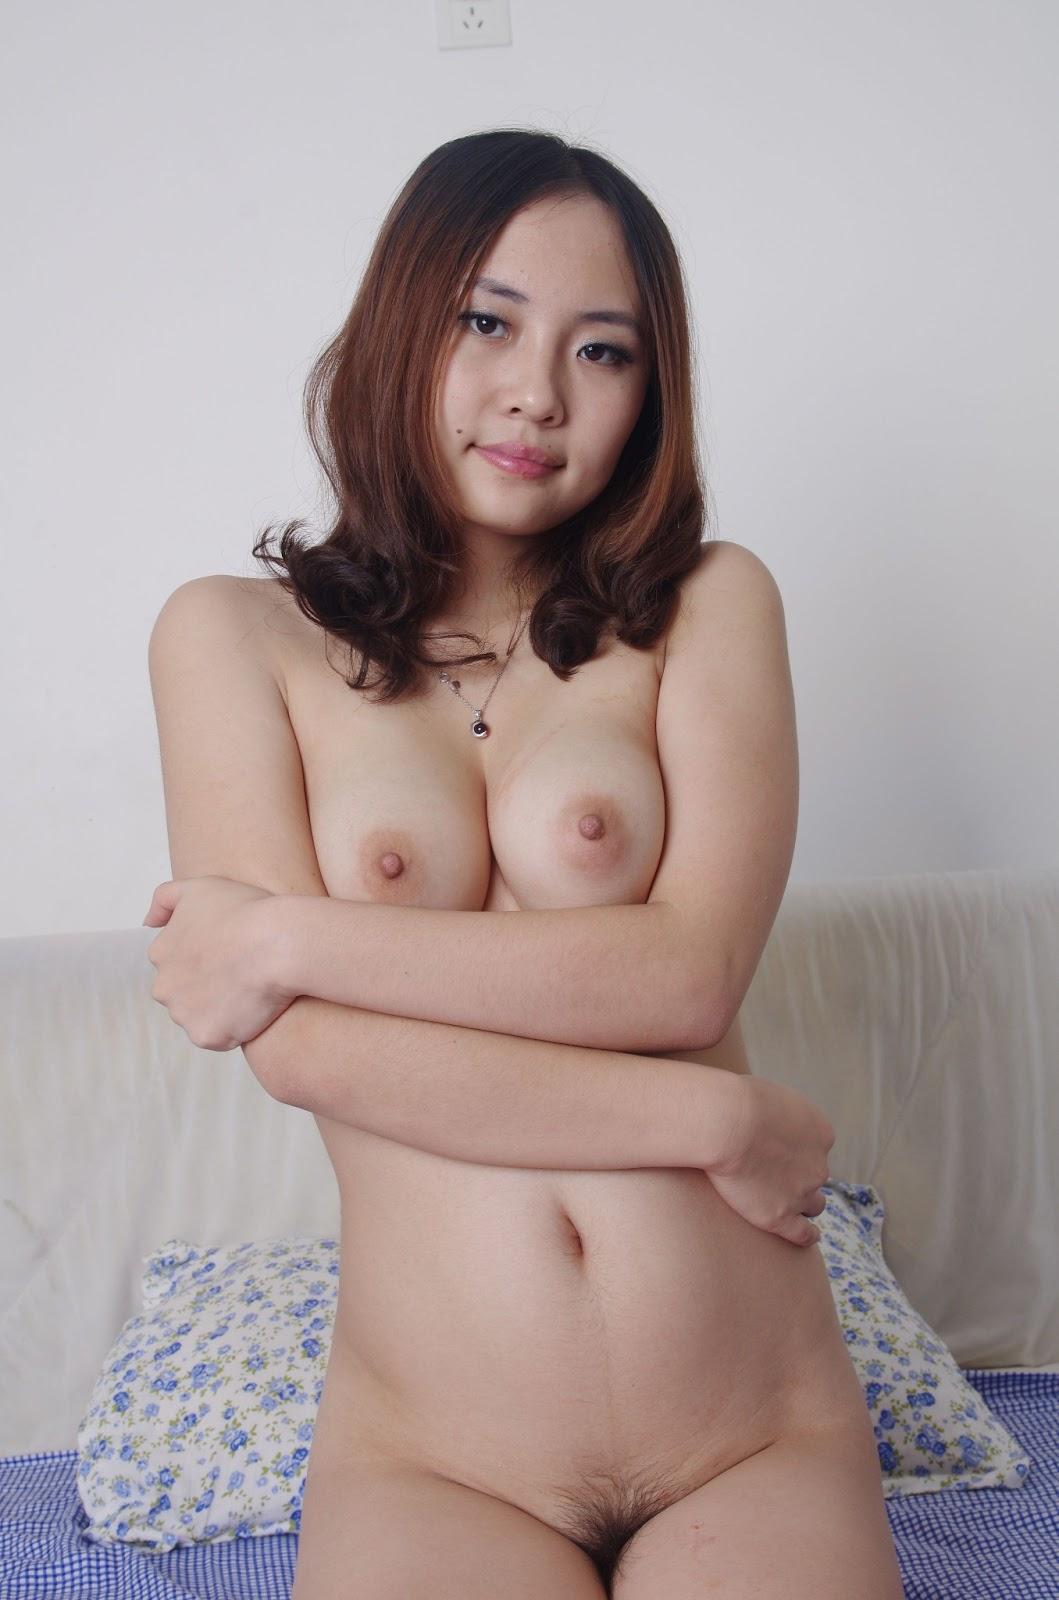 Thai Nude Girl Pics